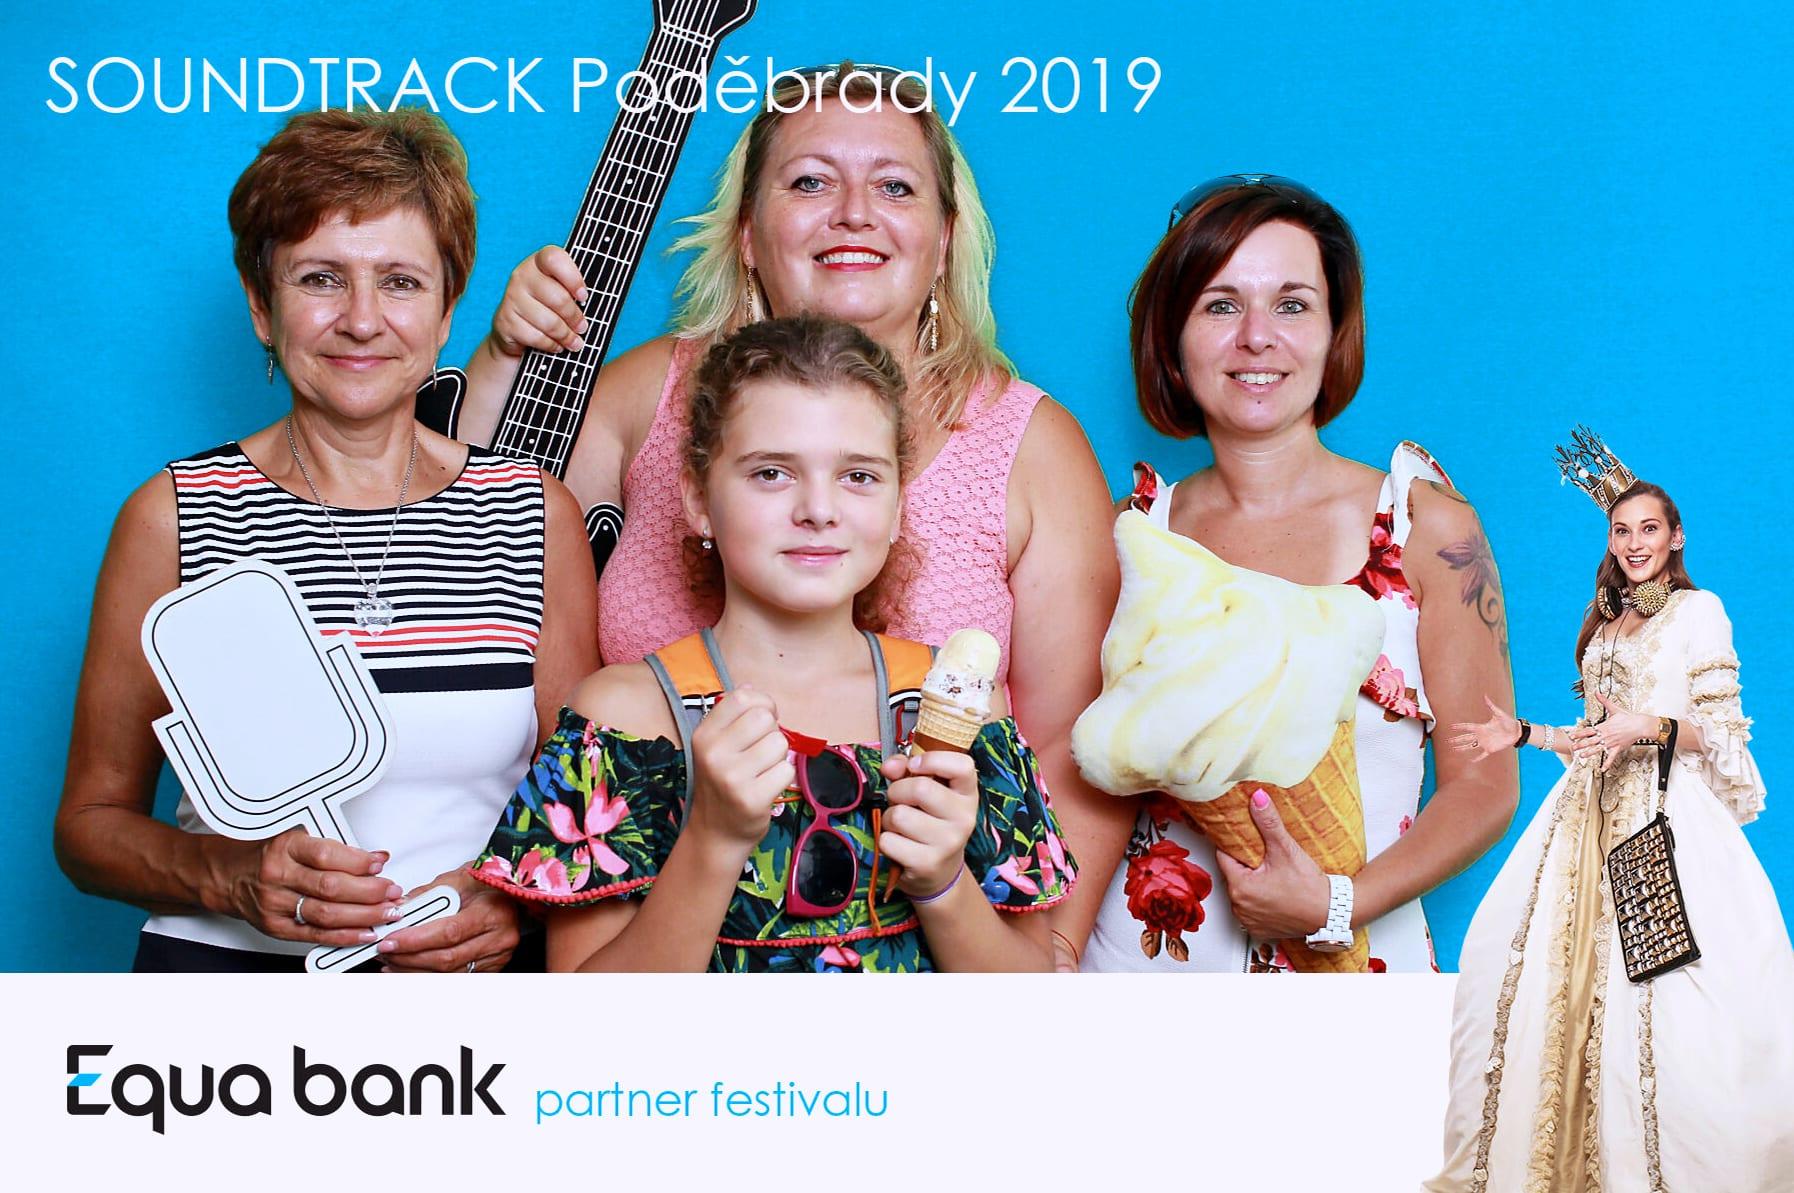 fotokoutek-festival-praha-equa-bank-31-8-2019-647001